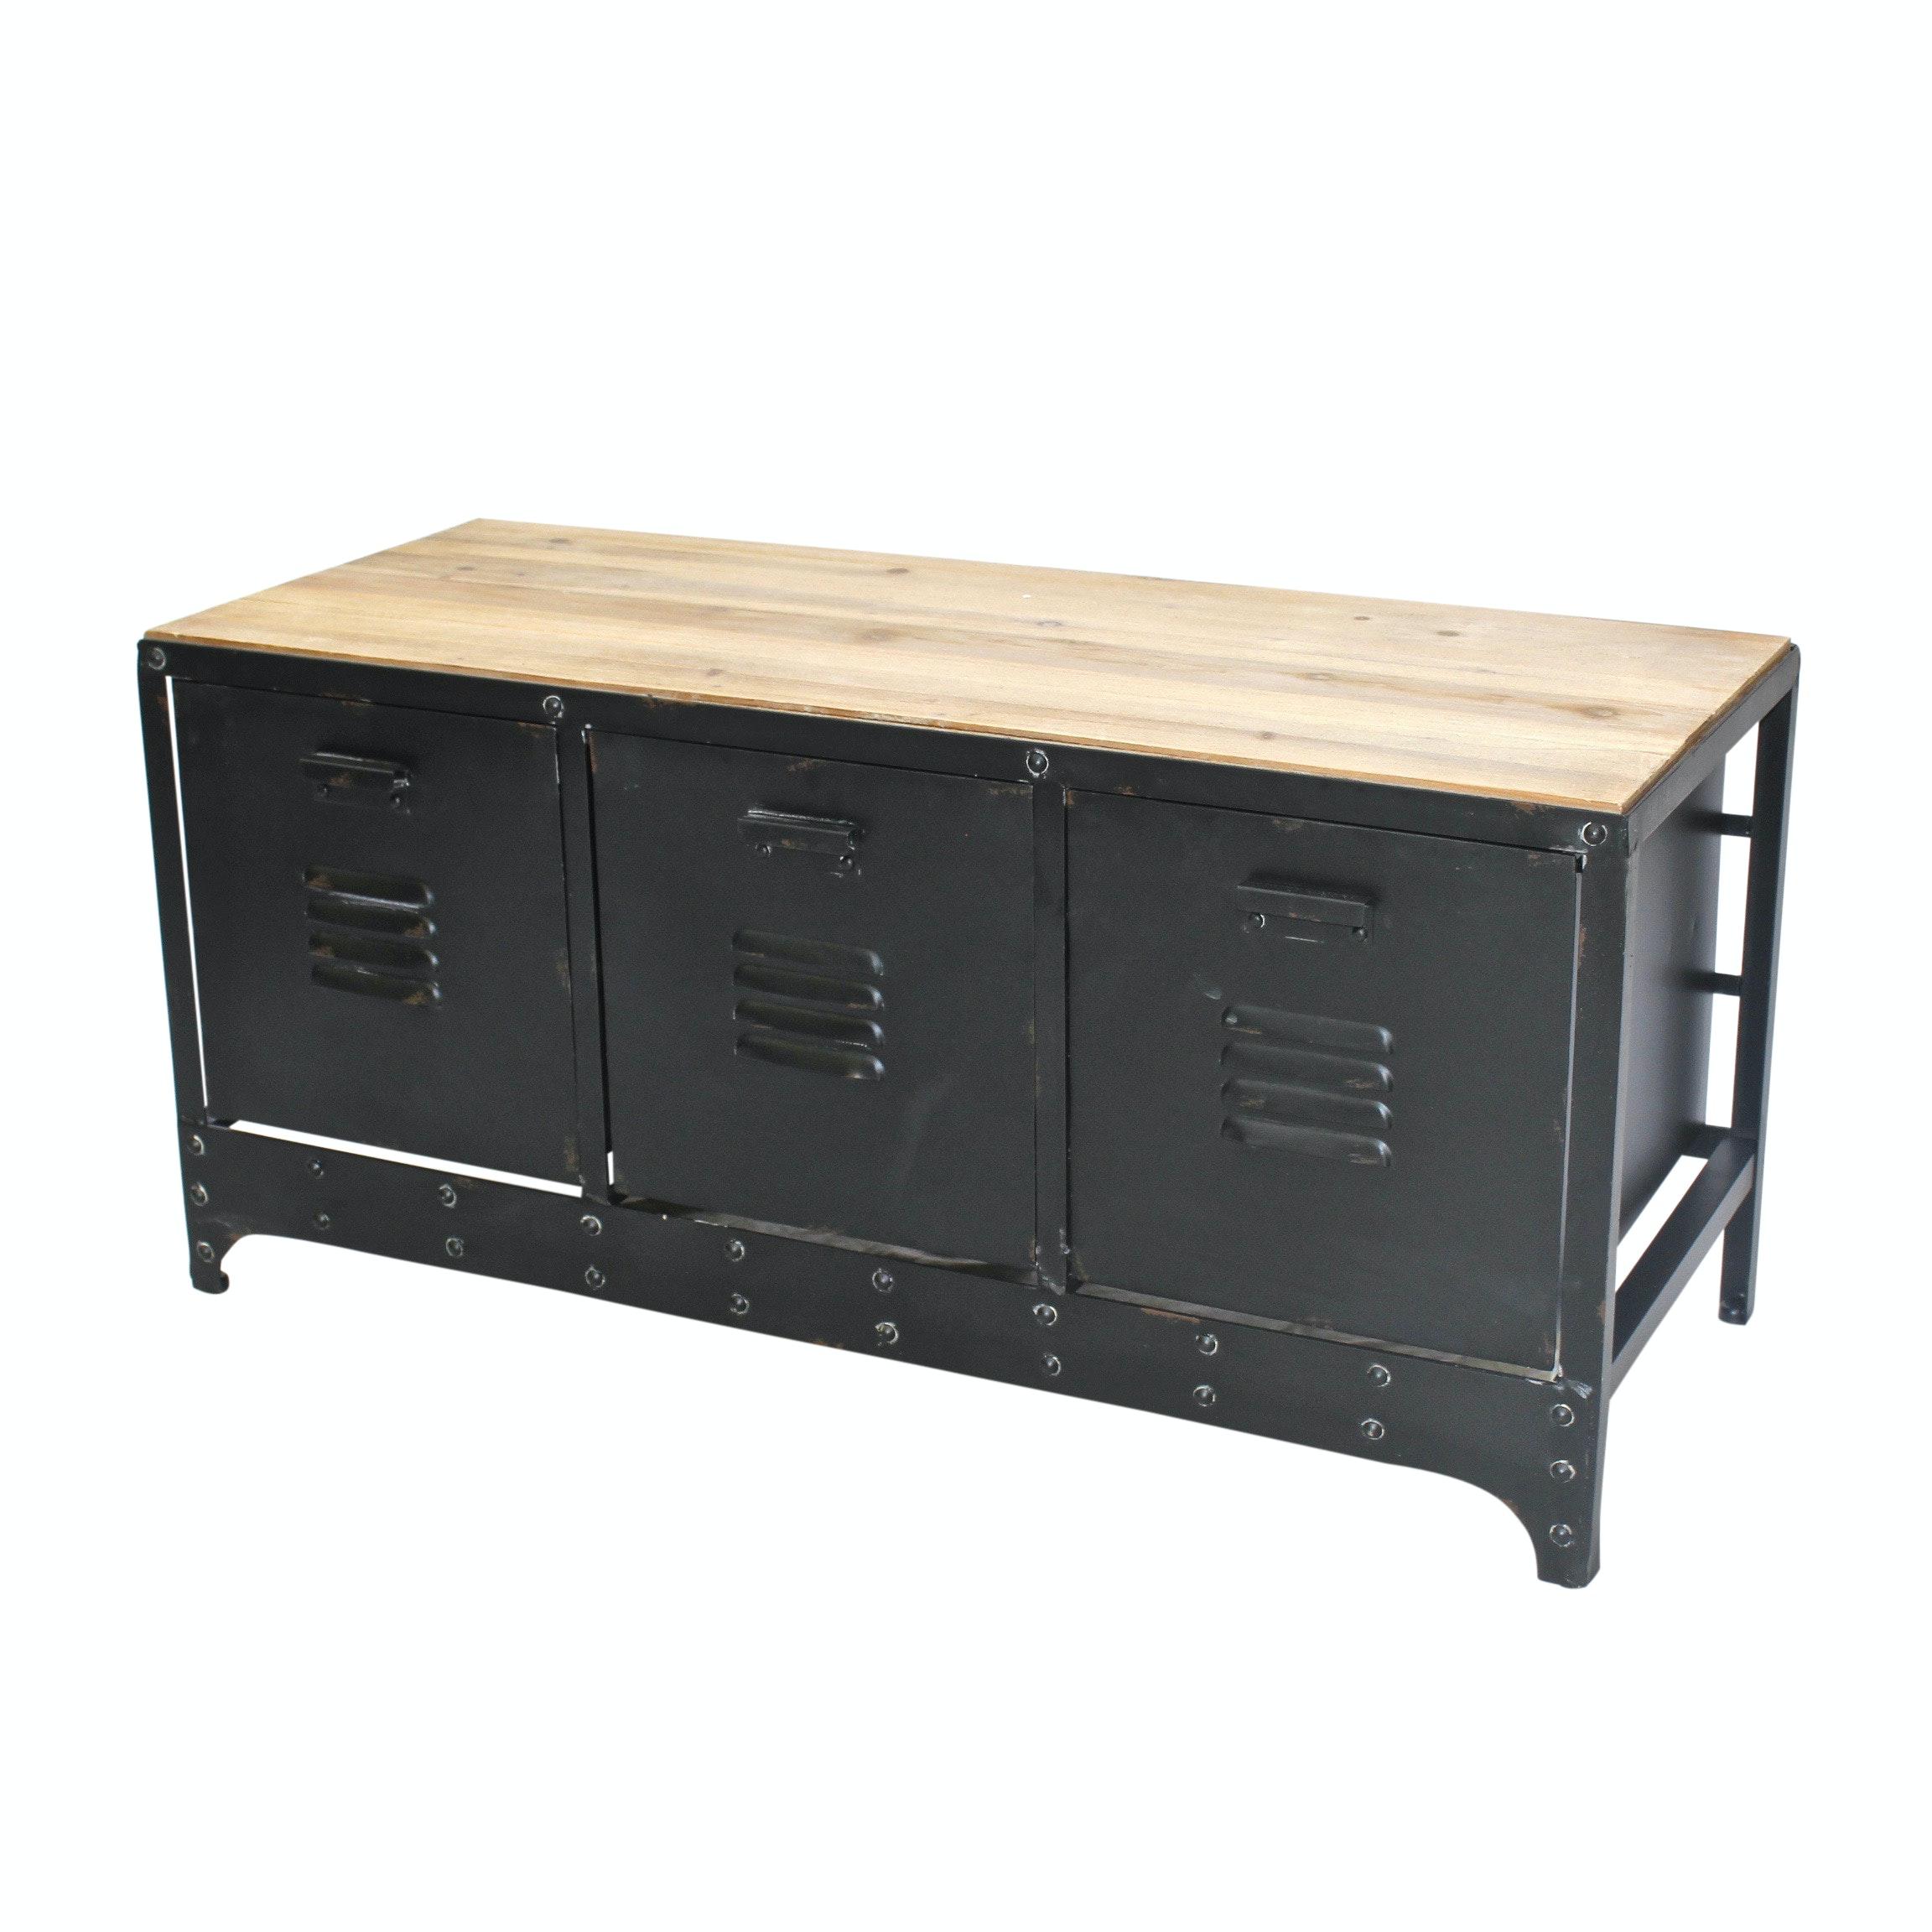 Three Storage Bin Locker Style Cabinet, Contemporary